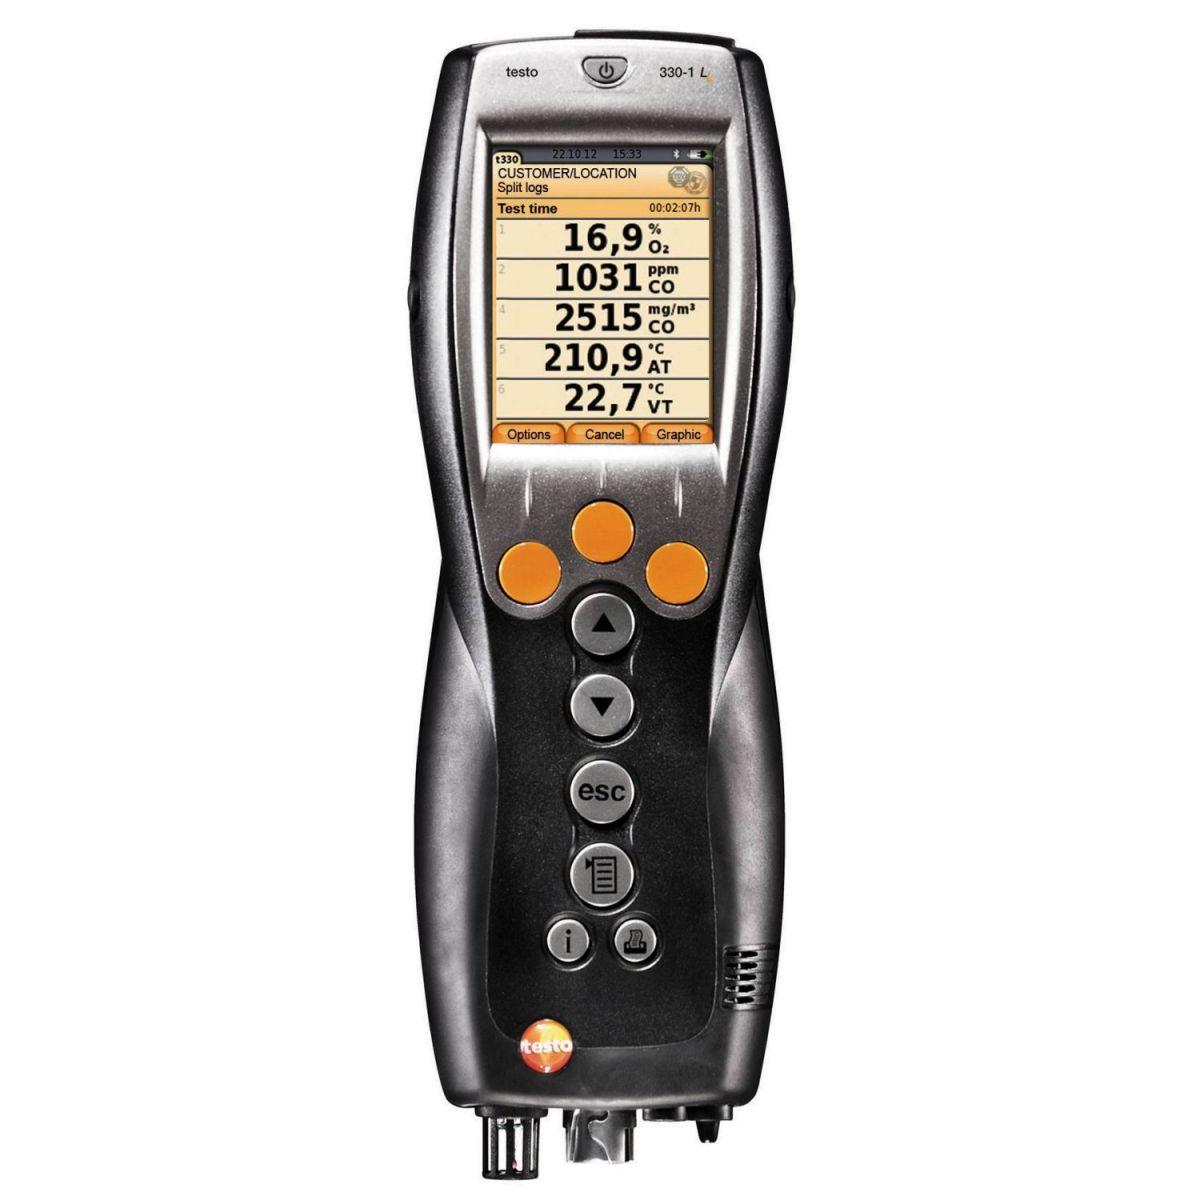 testo 330-1 LL专业型烟气分析仪图片